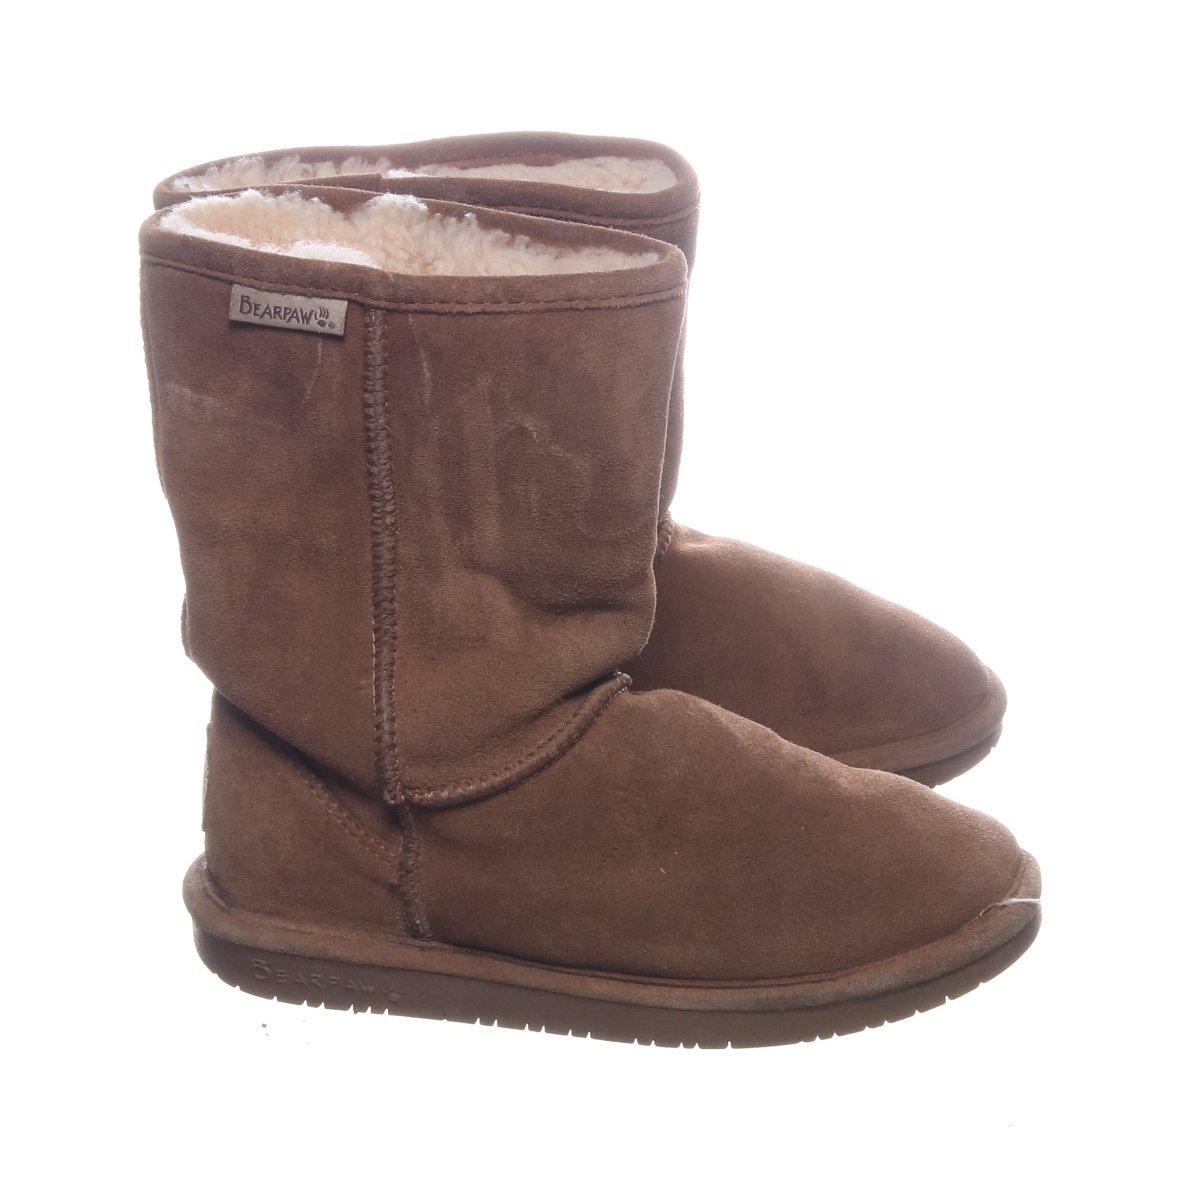 Bearpaw, Boots, Strl: 37, Emma short, Bru.. (407310404) ᐈ